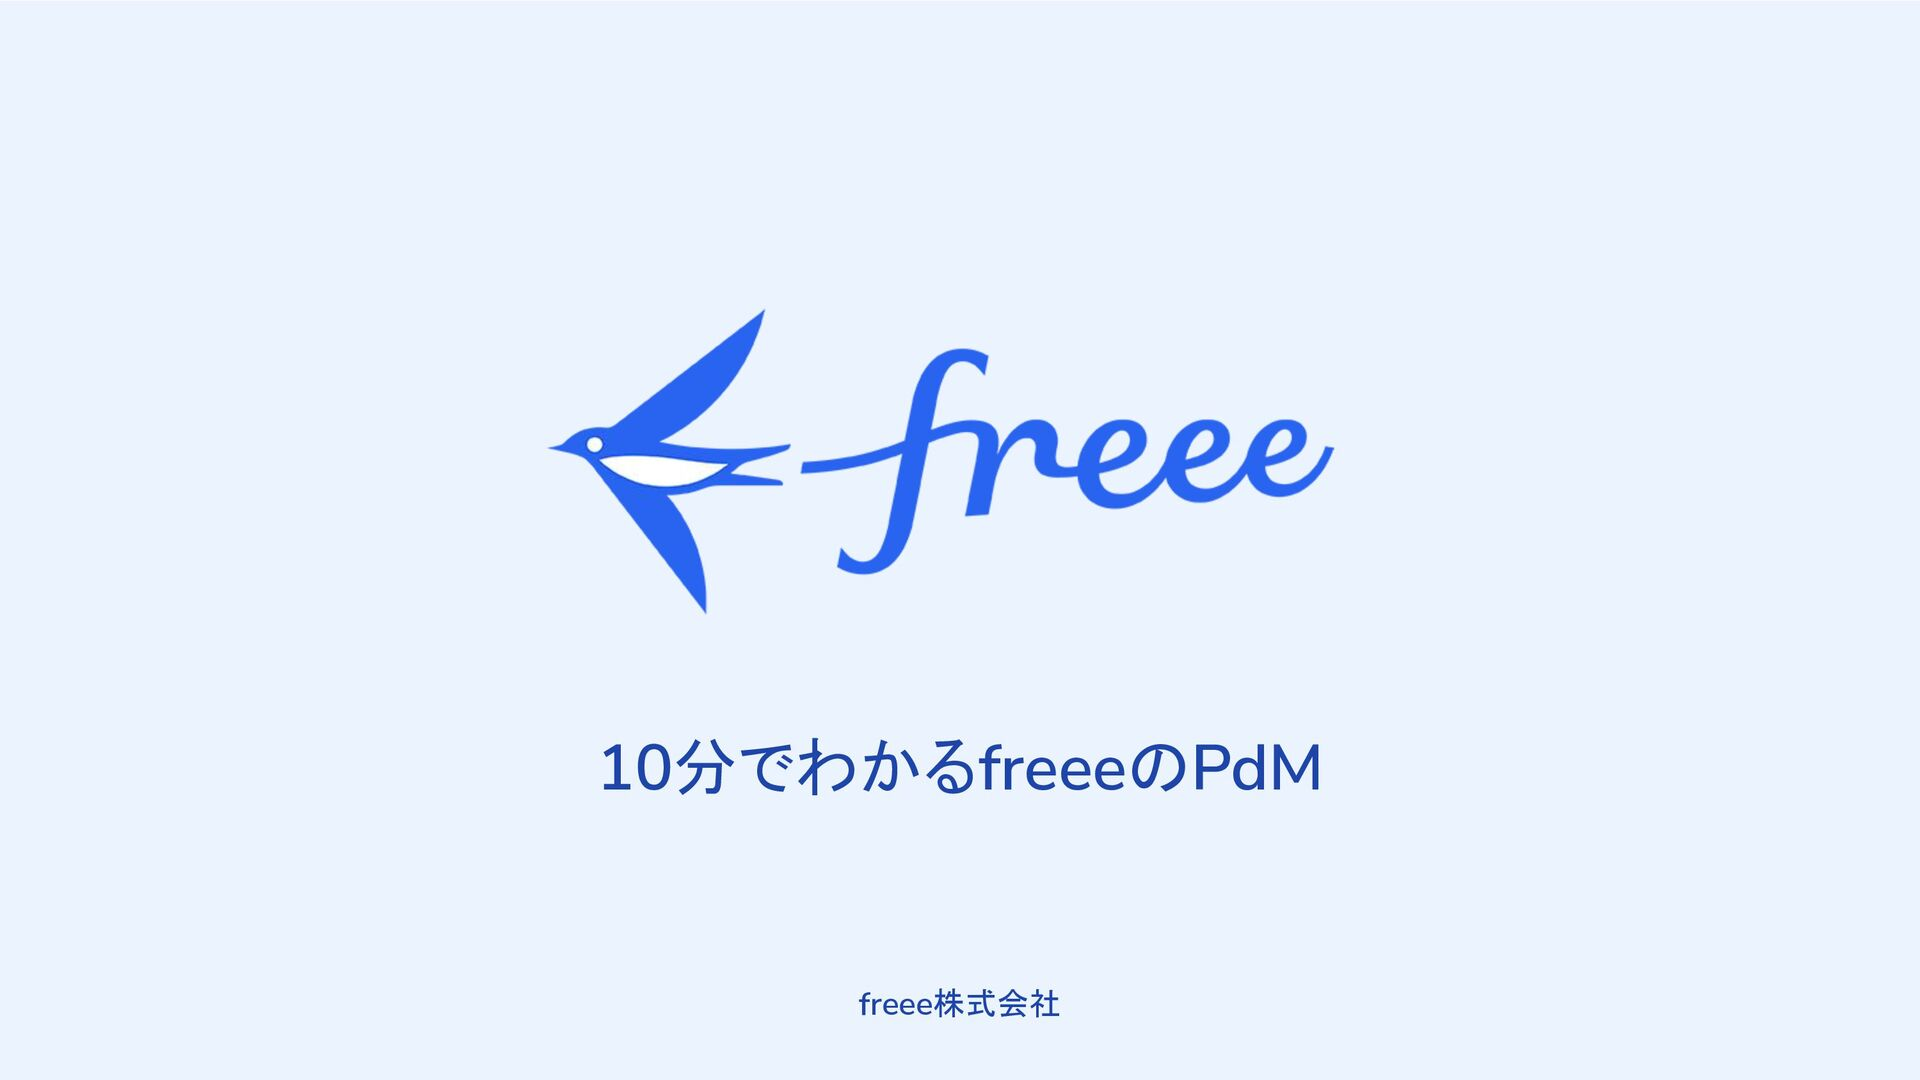 1 freee 株式会社 freeeのご紹介 as of 2019.08